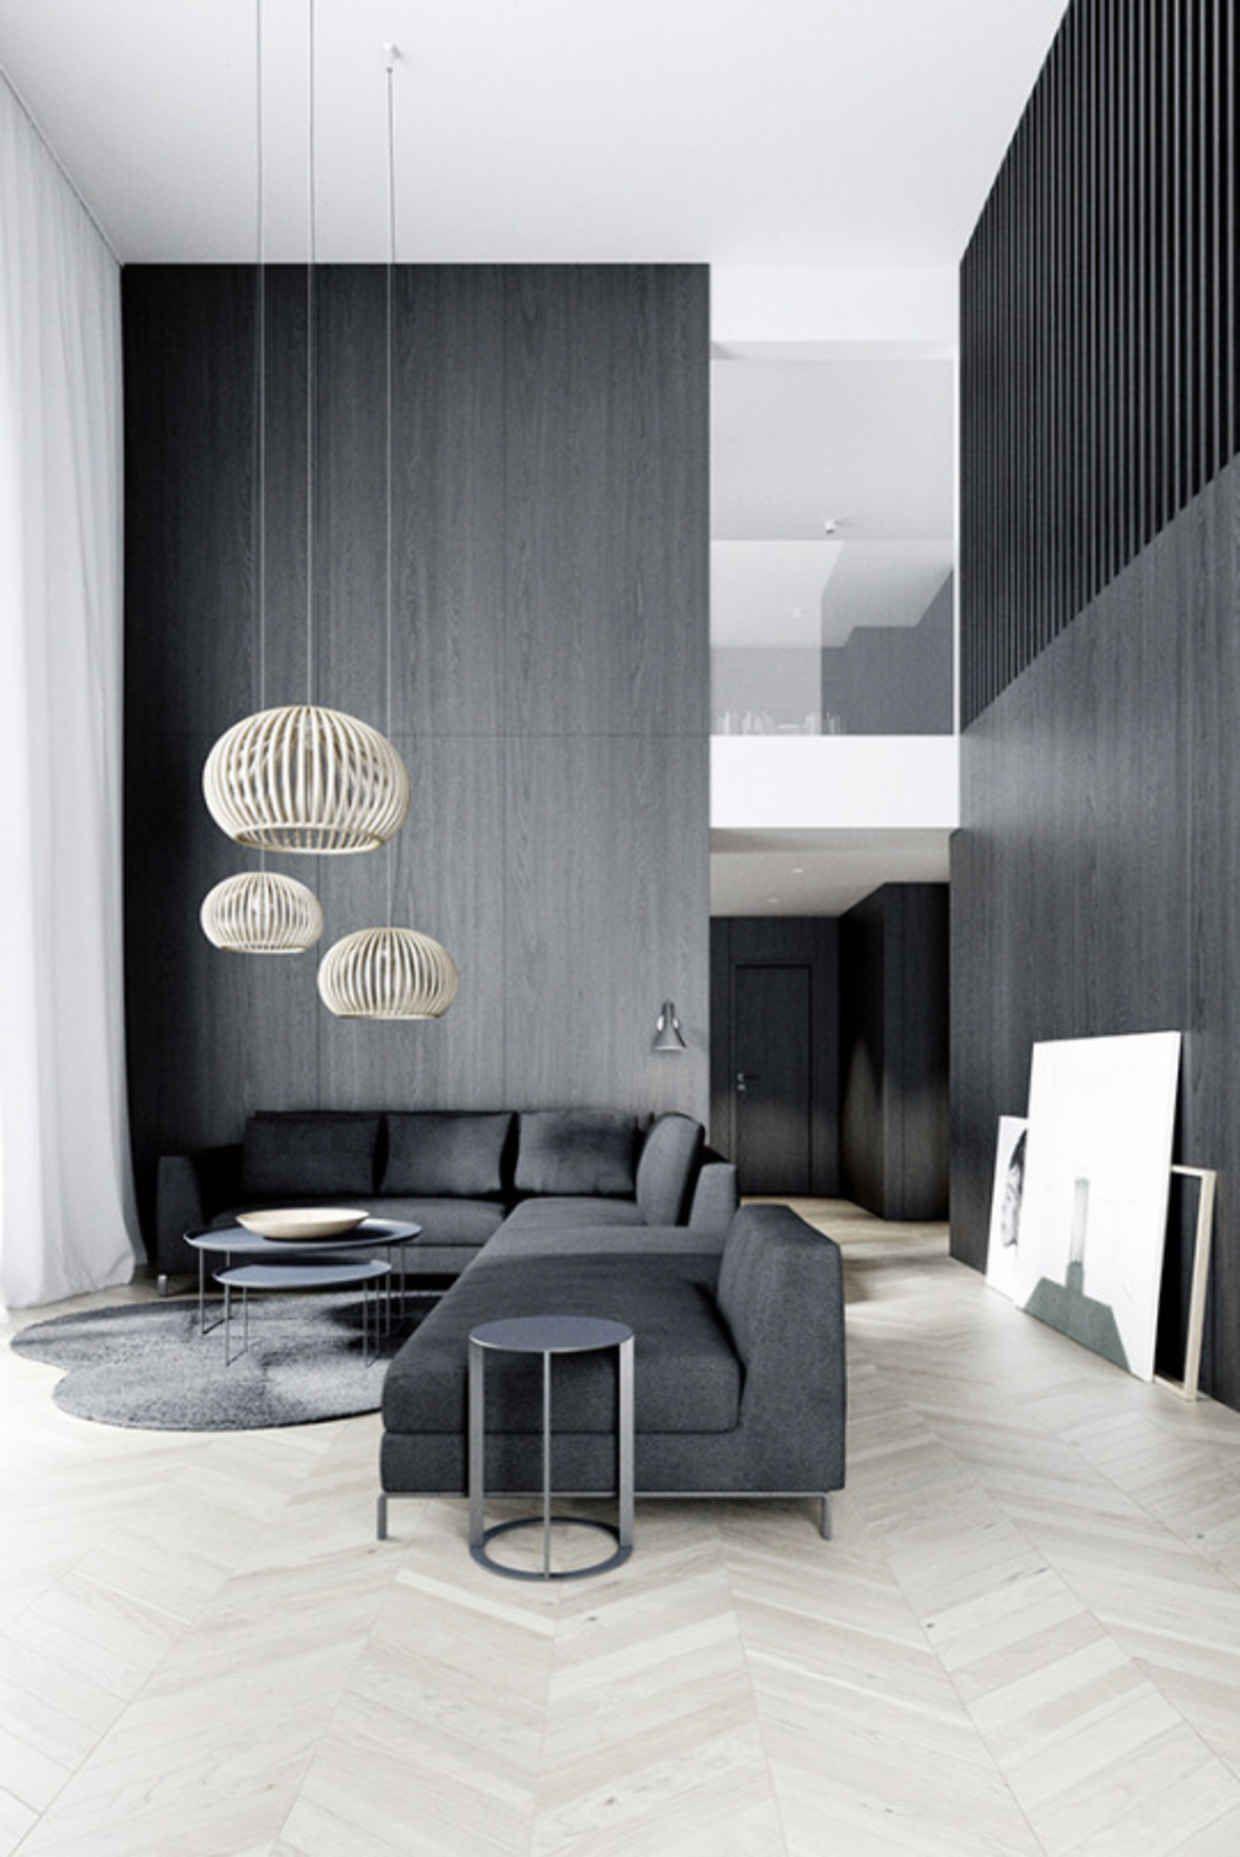 Modern Minimalist Living Room Design: Inspiring Examples Of Minimal Interior Design 5